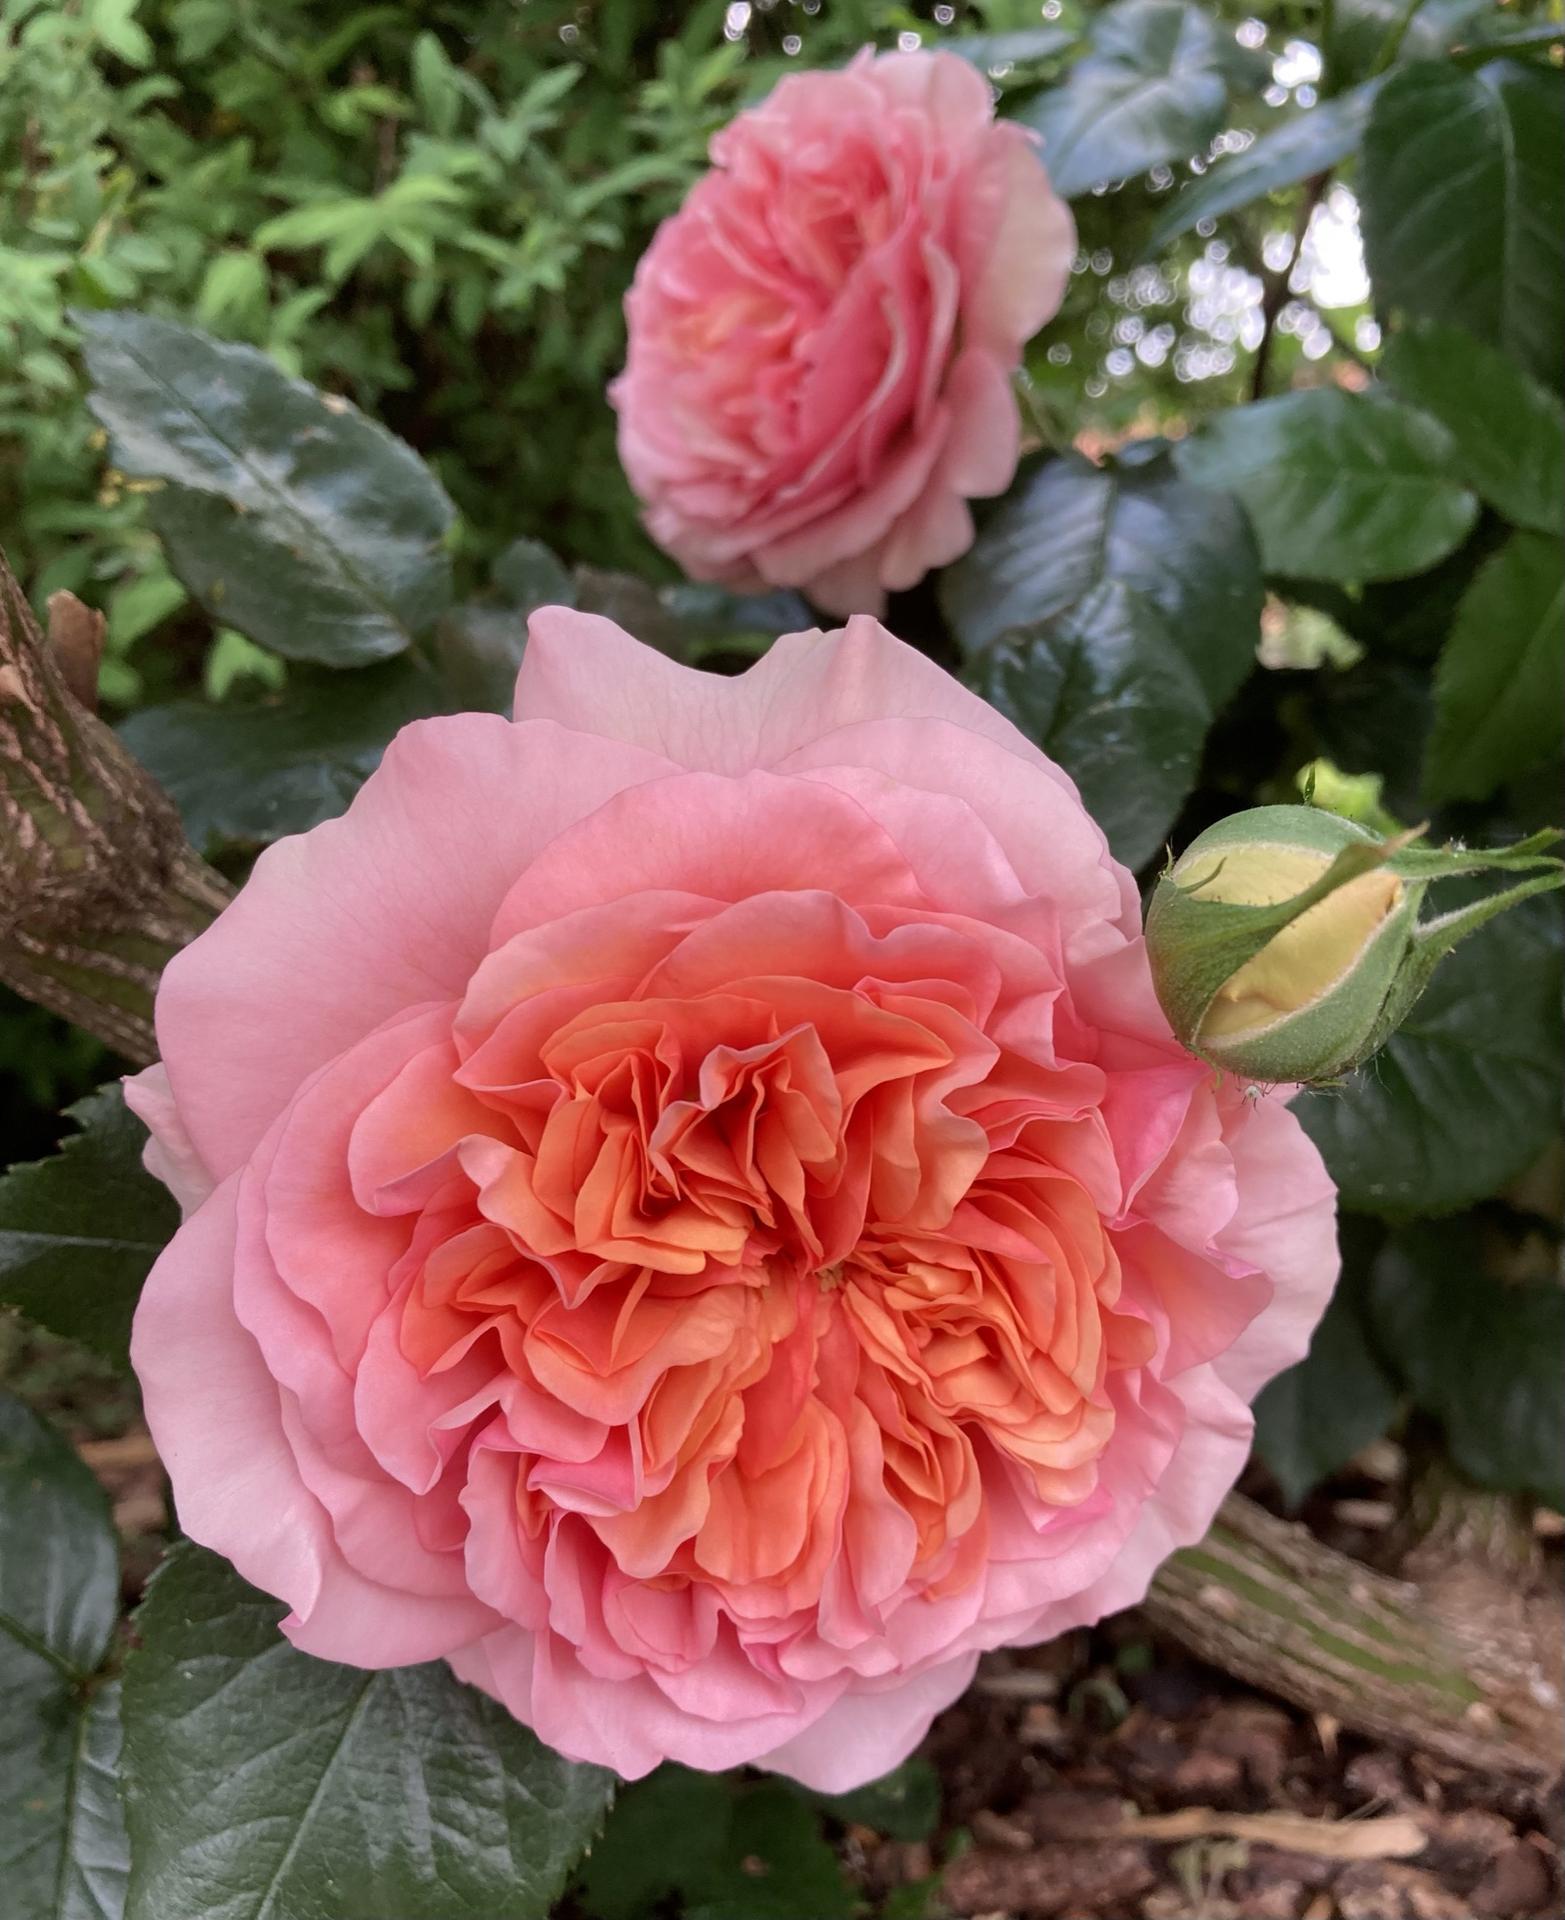 Zahrada 2021 - Chippendale a jeho prvni dva letosni kvety... statecne bojoval s Eglantynou o letosni prvenstvi a skoncil na skvelem druhem miste ❤️